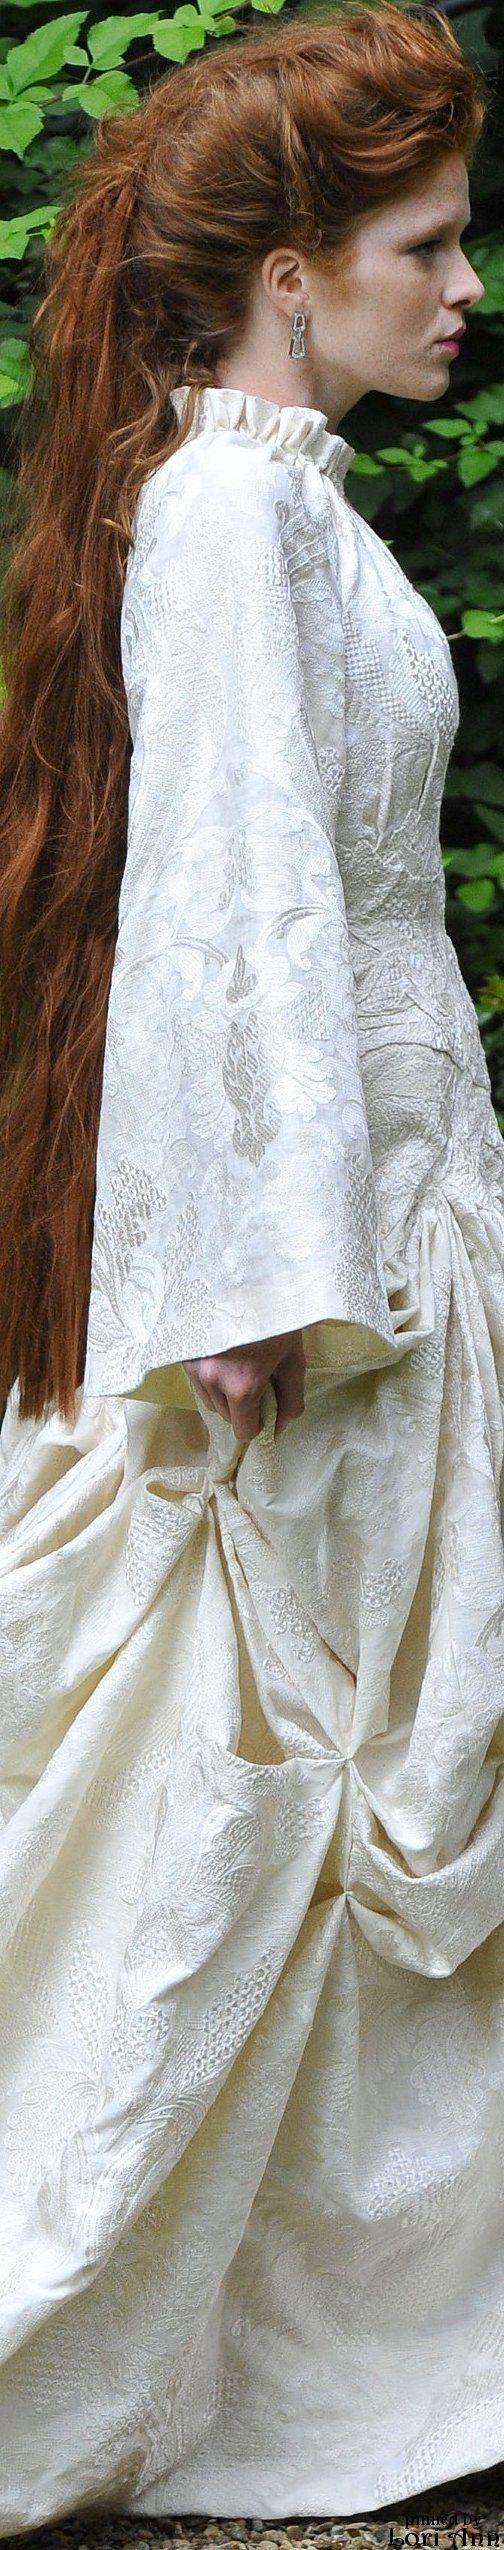 Franck Sorbier Haute Couture Fall 2013